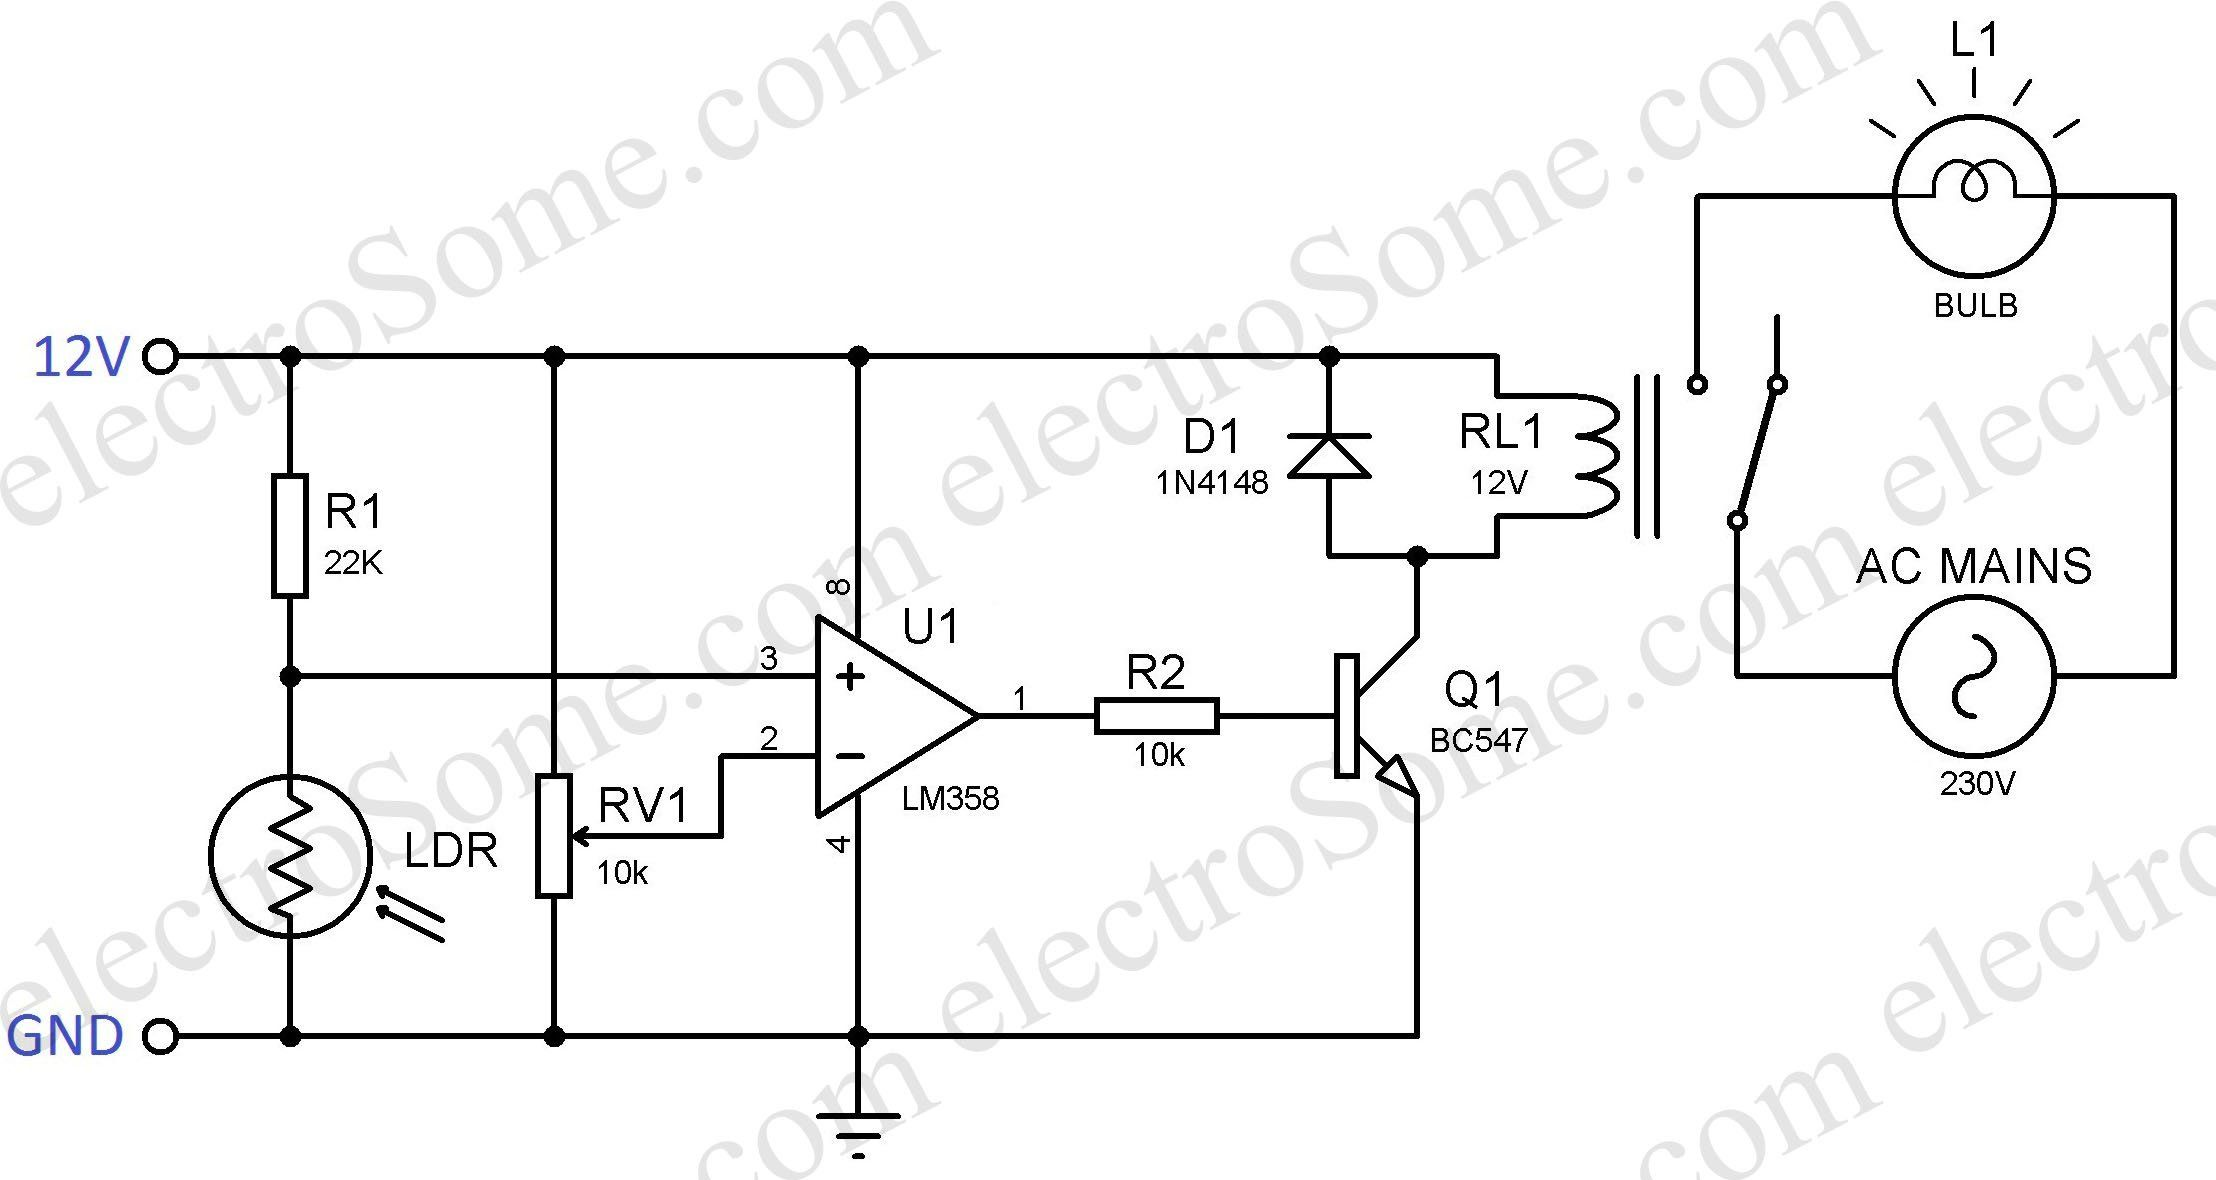 hight resolution of solar street light block diagram solar street light circuit diagram solar led night light circuit diagram power supply block diagram joule